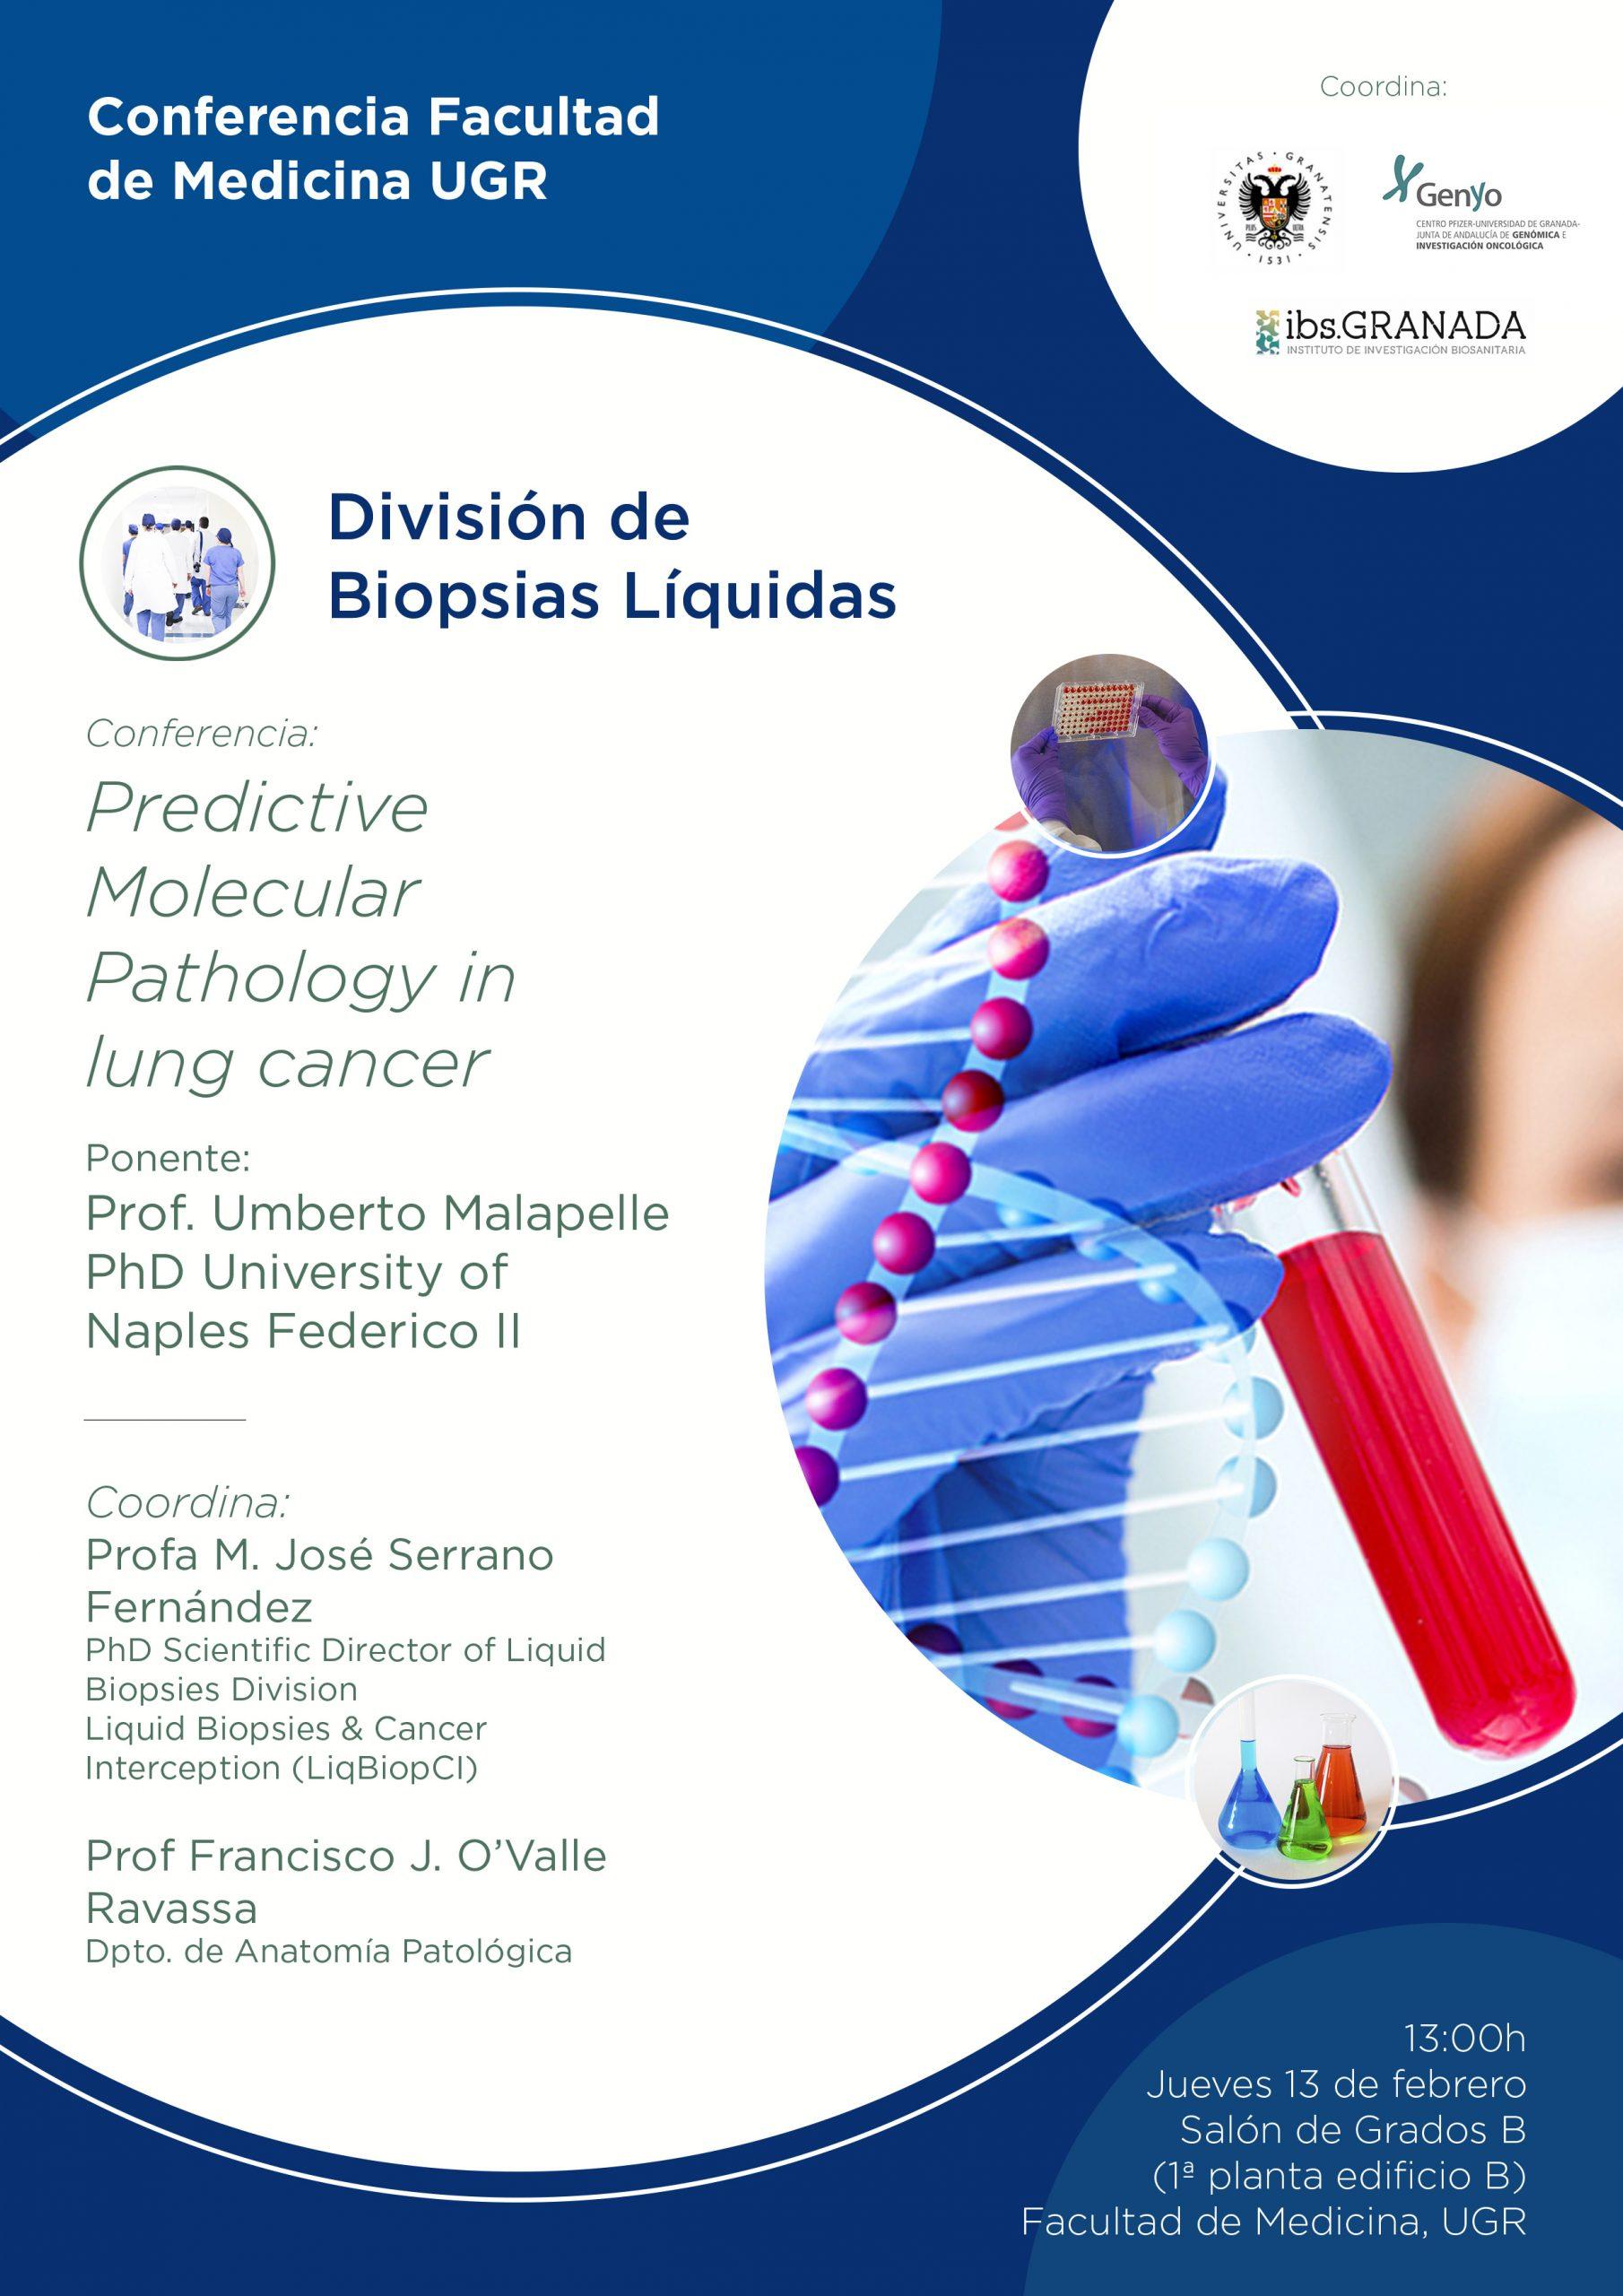 Conferencia Predictive Molecular Pathology in Lung Cancer